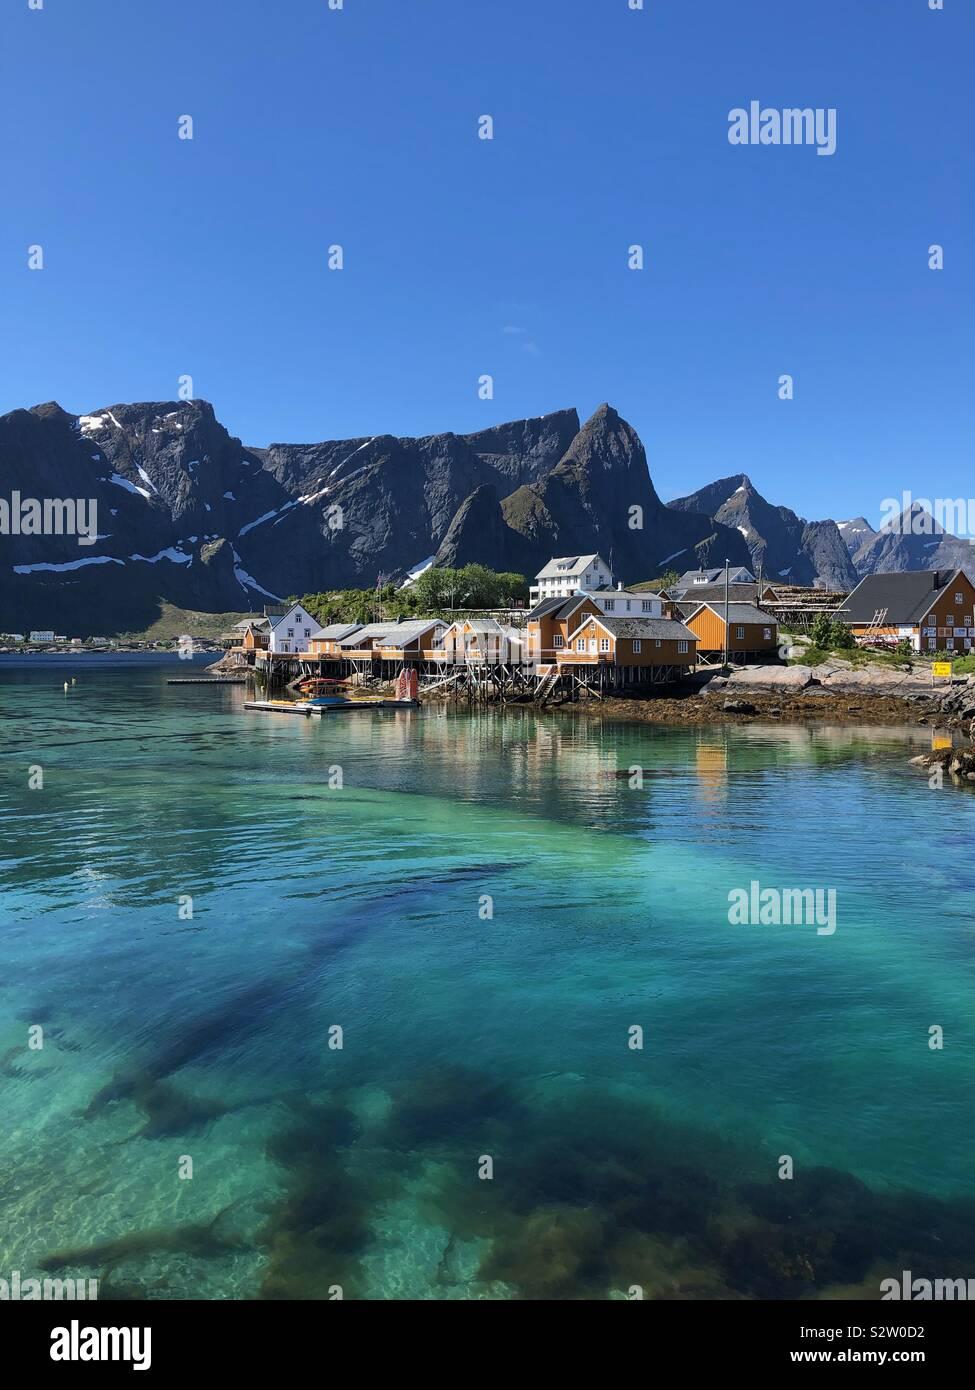 Hamnoy nelle Isole Lofoten in Norvegia. Foto Stock